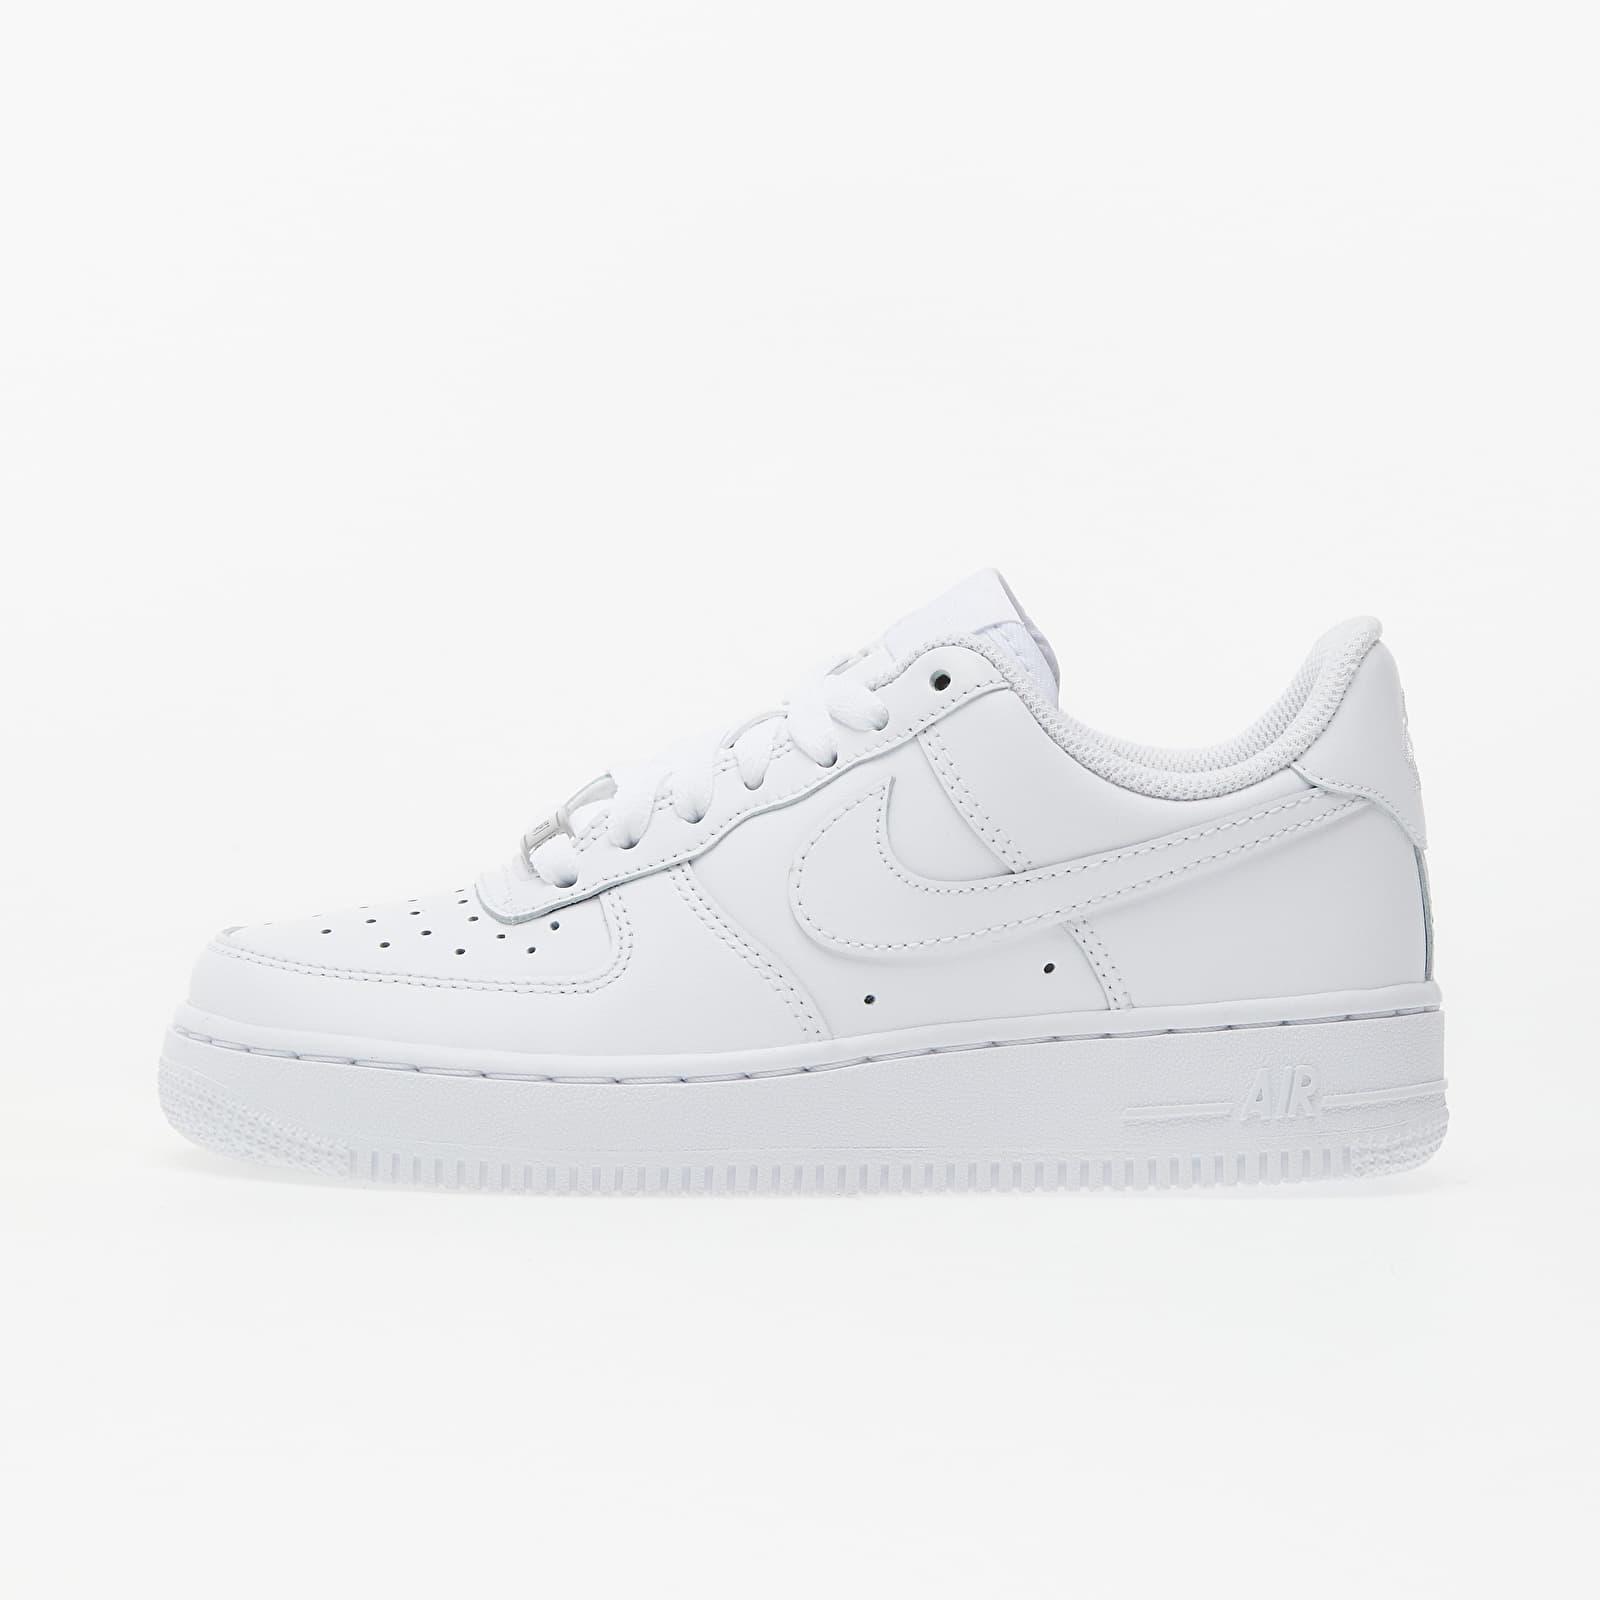 Dámske topánky a tenisky Nike Wmns Air Force 1 '07 White/ White